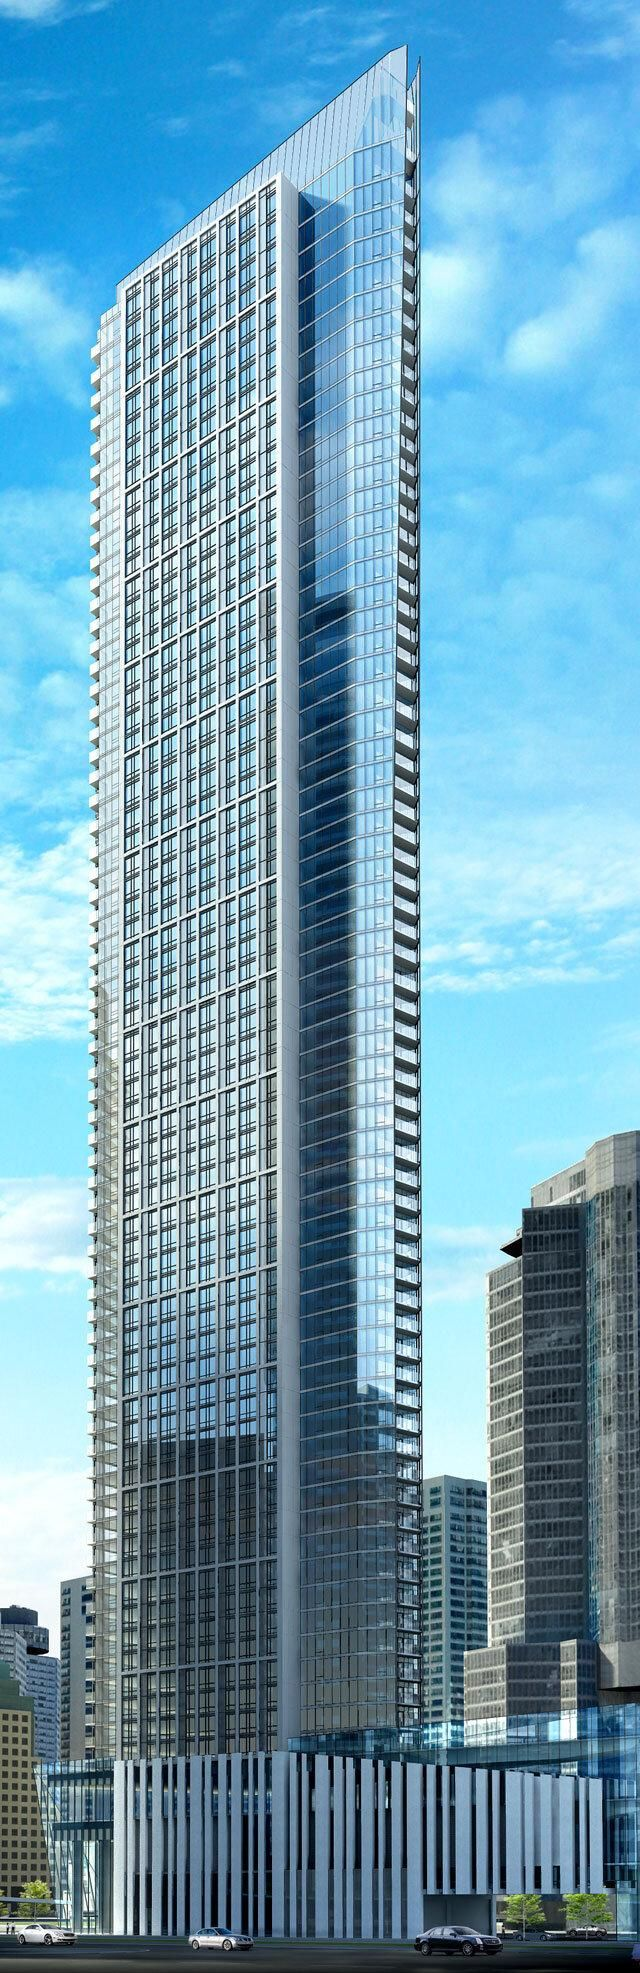 Ten York Condominium in Toronto, Canada by Wallman Architects #architecture ☮k☮ Toronto Condos Suzana Davies Remax Realtron suzdavies@trebnet.com www.suzanadavieshomeseek.com